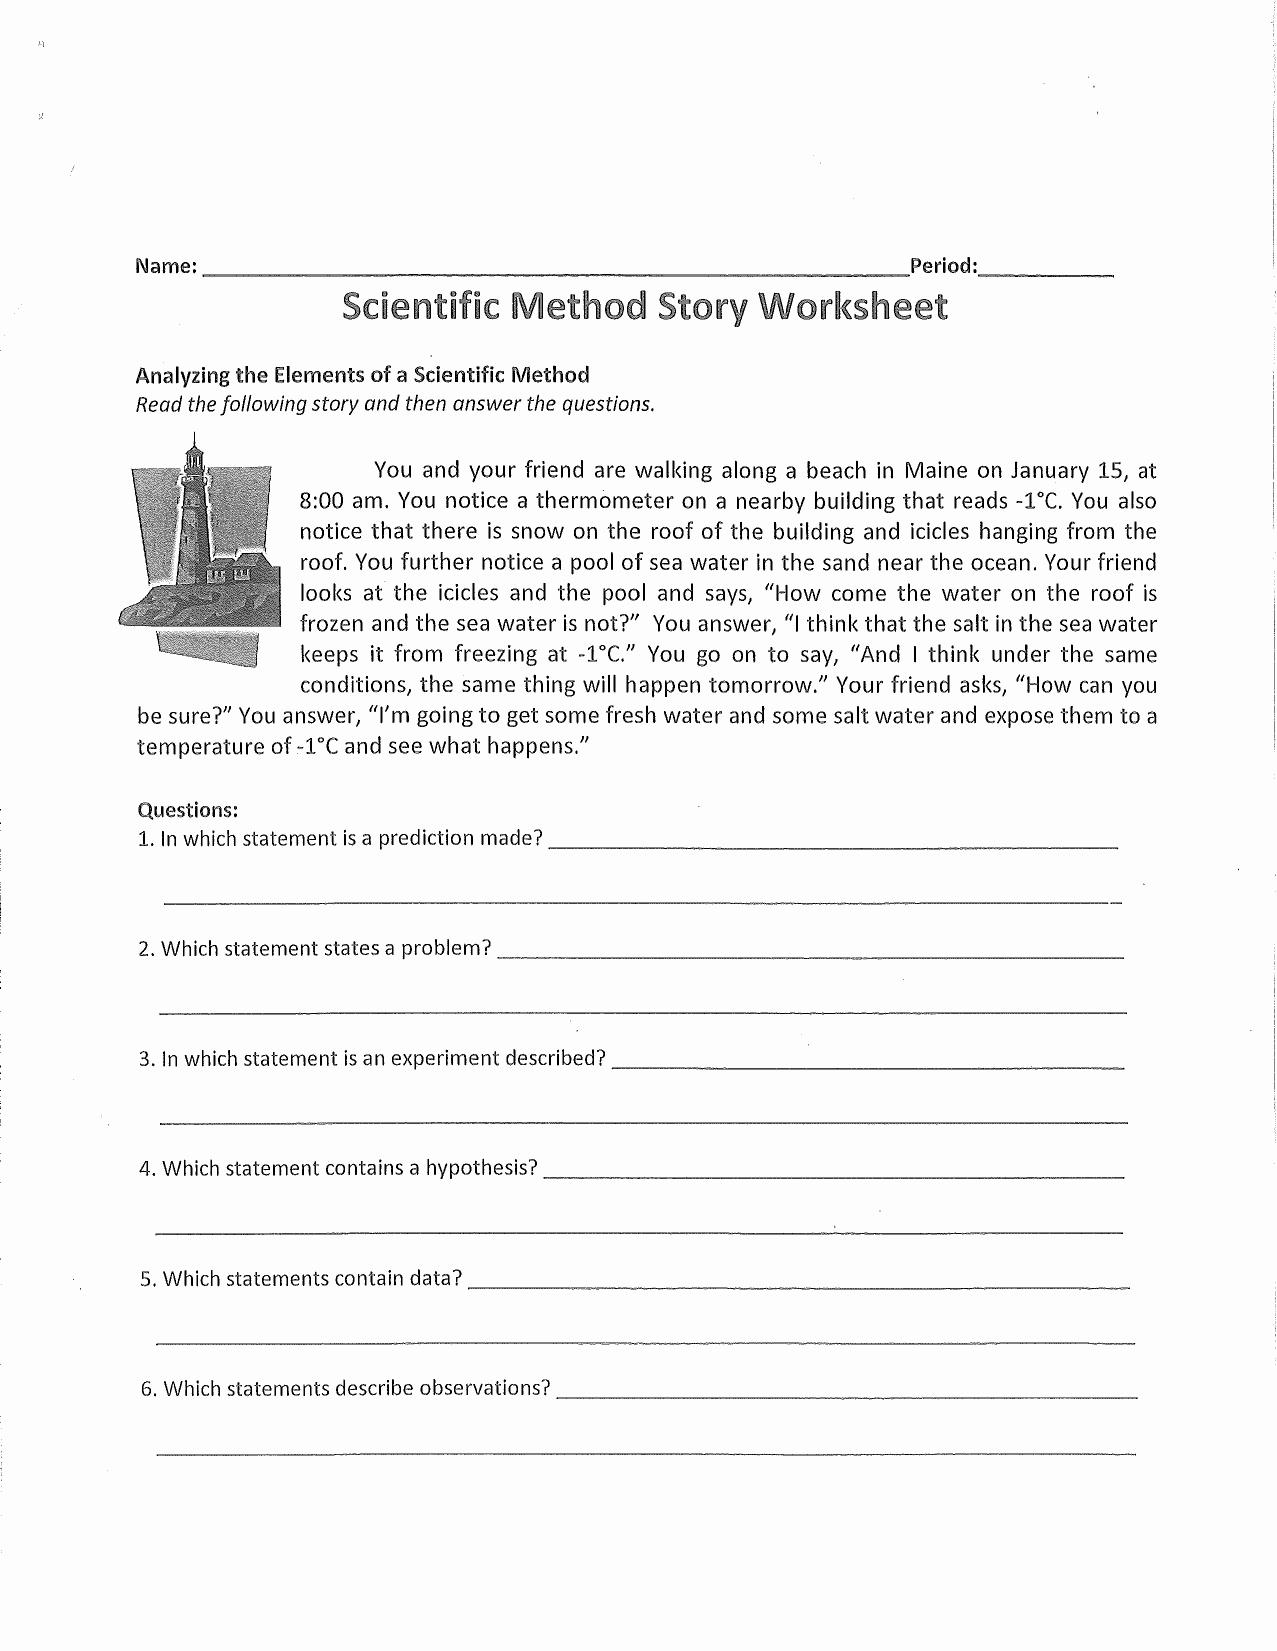 The Scientific Method Worksheet Inspirational Scientific Method Story Worksheet